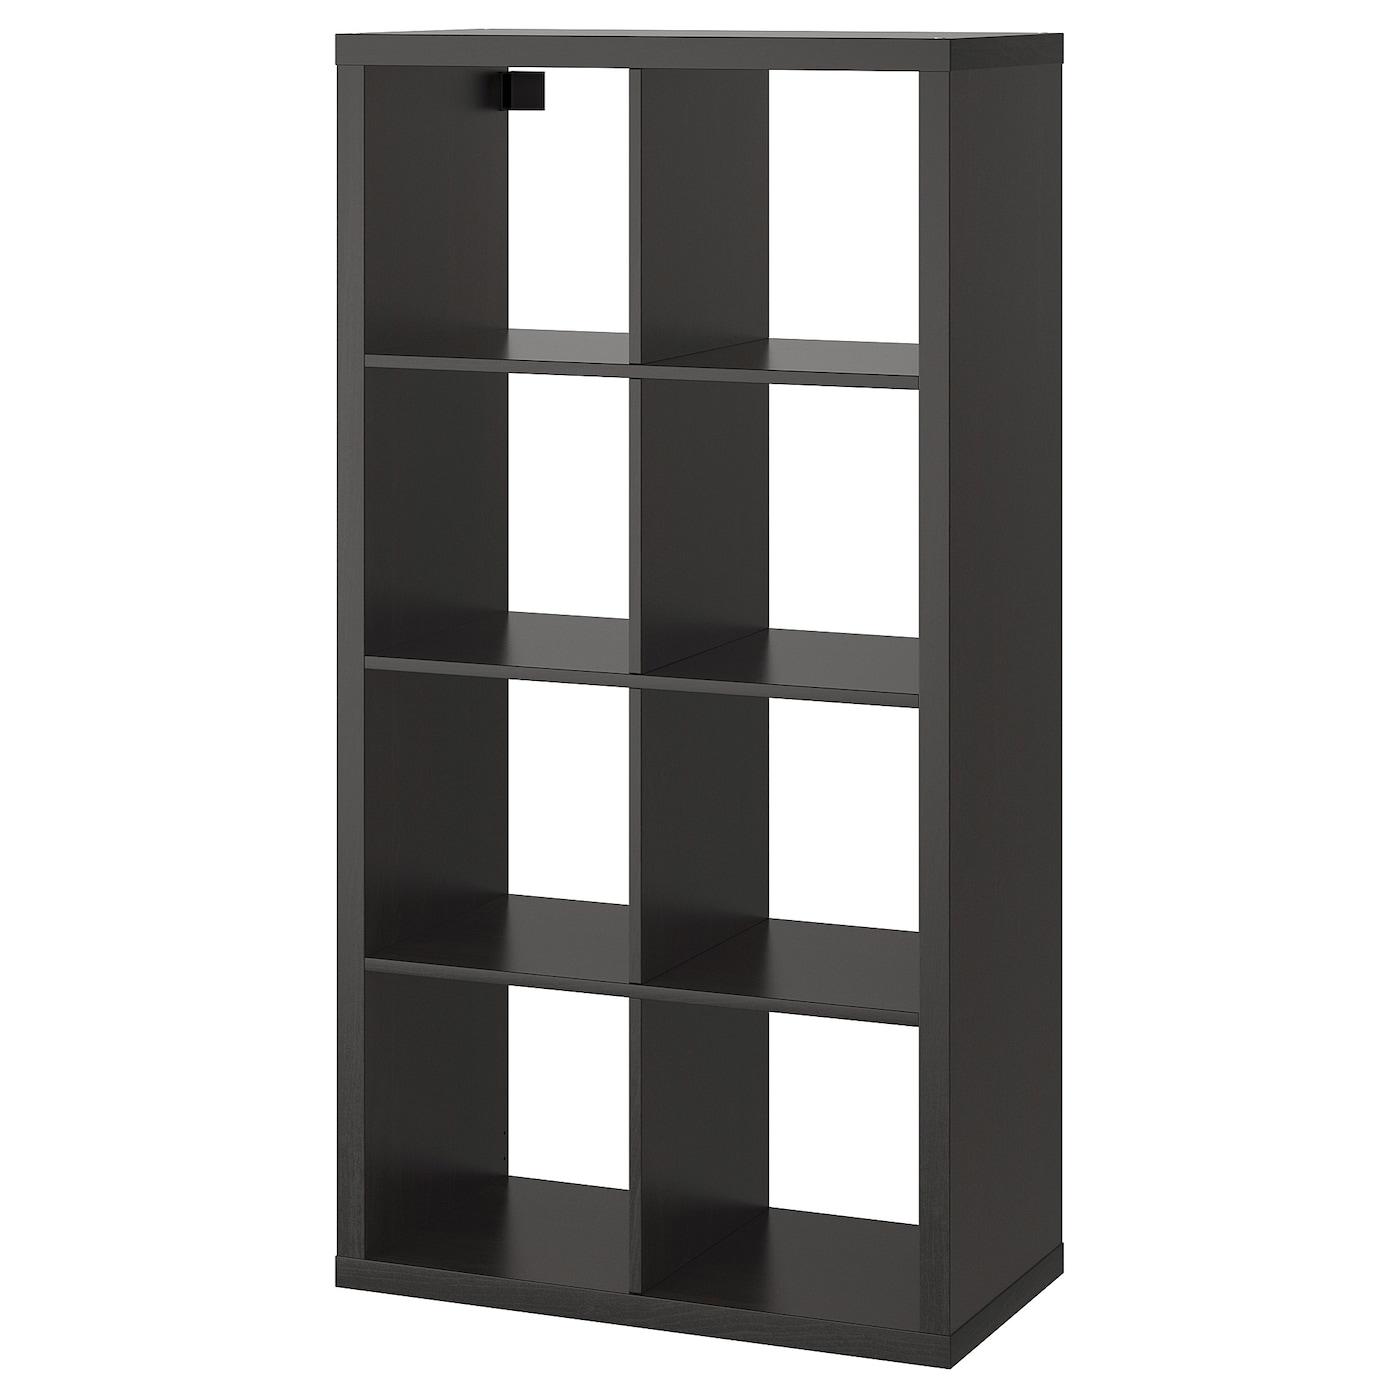 kallax shelving unit black brown 77 x 147 cm ikea. Black Bedroom Furniture Sets. Home Design Ideas